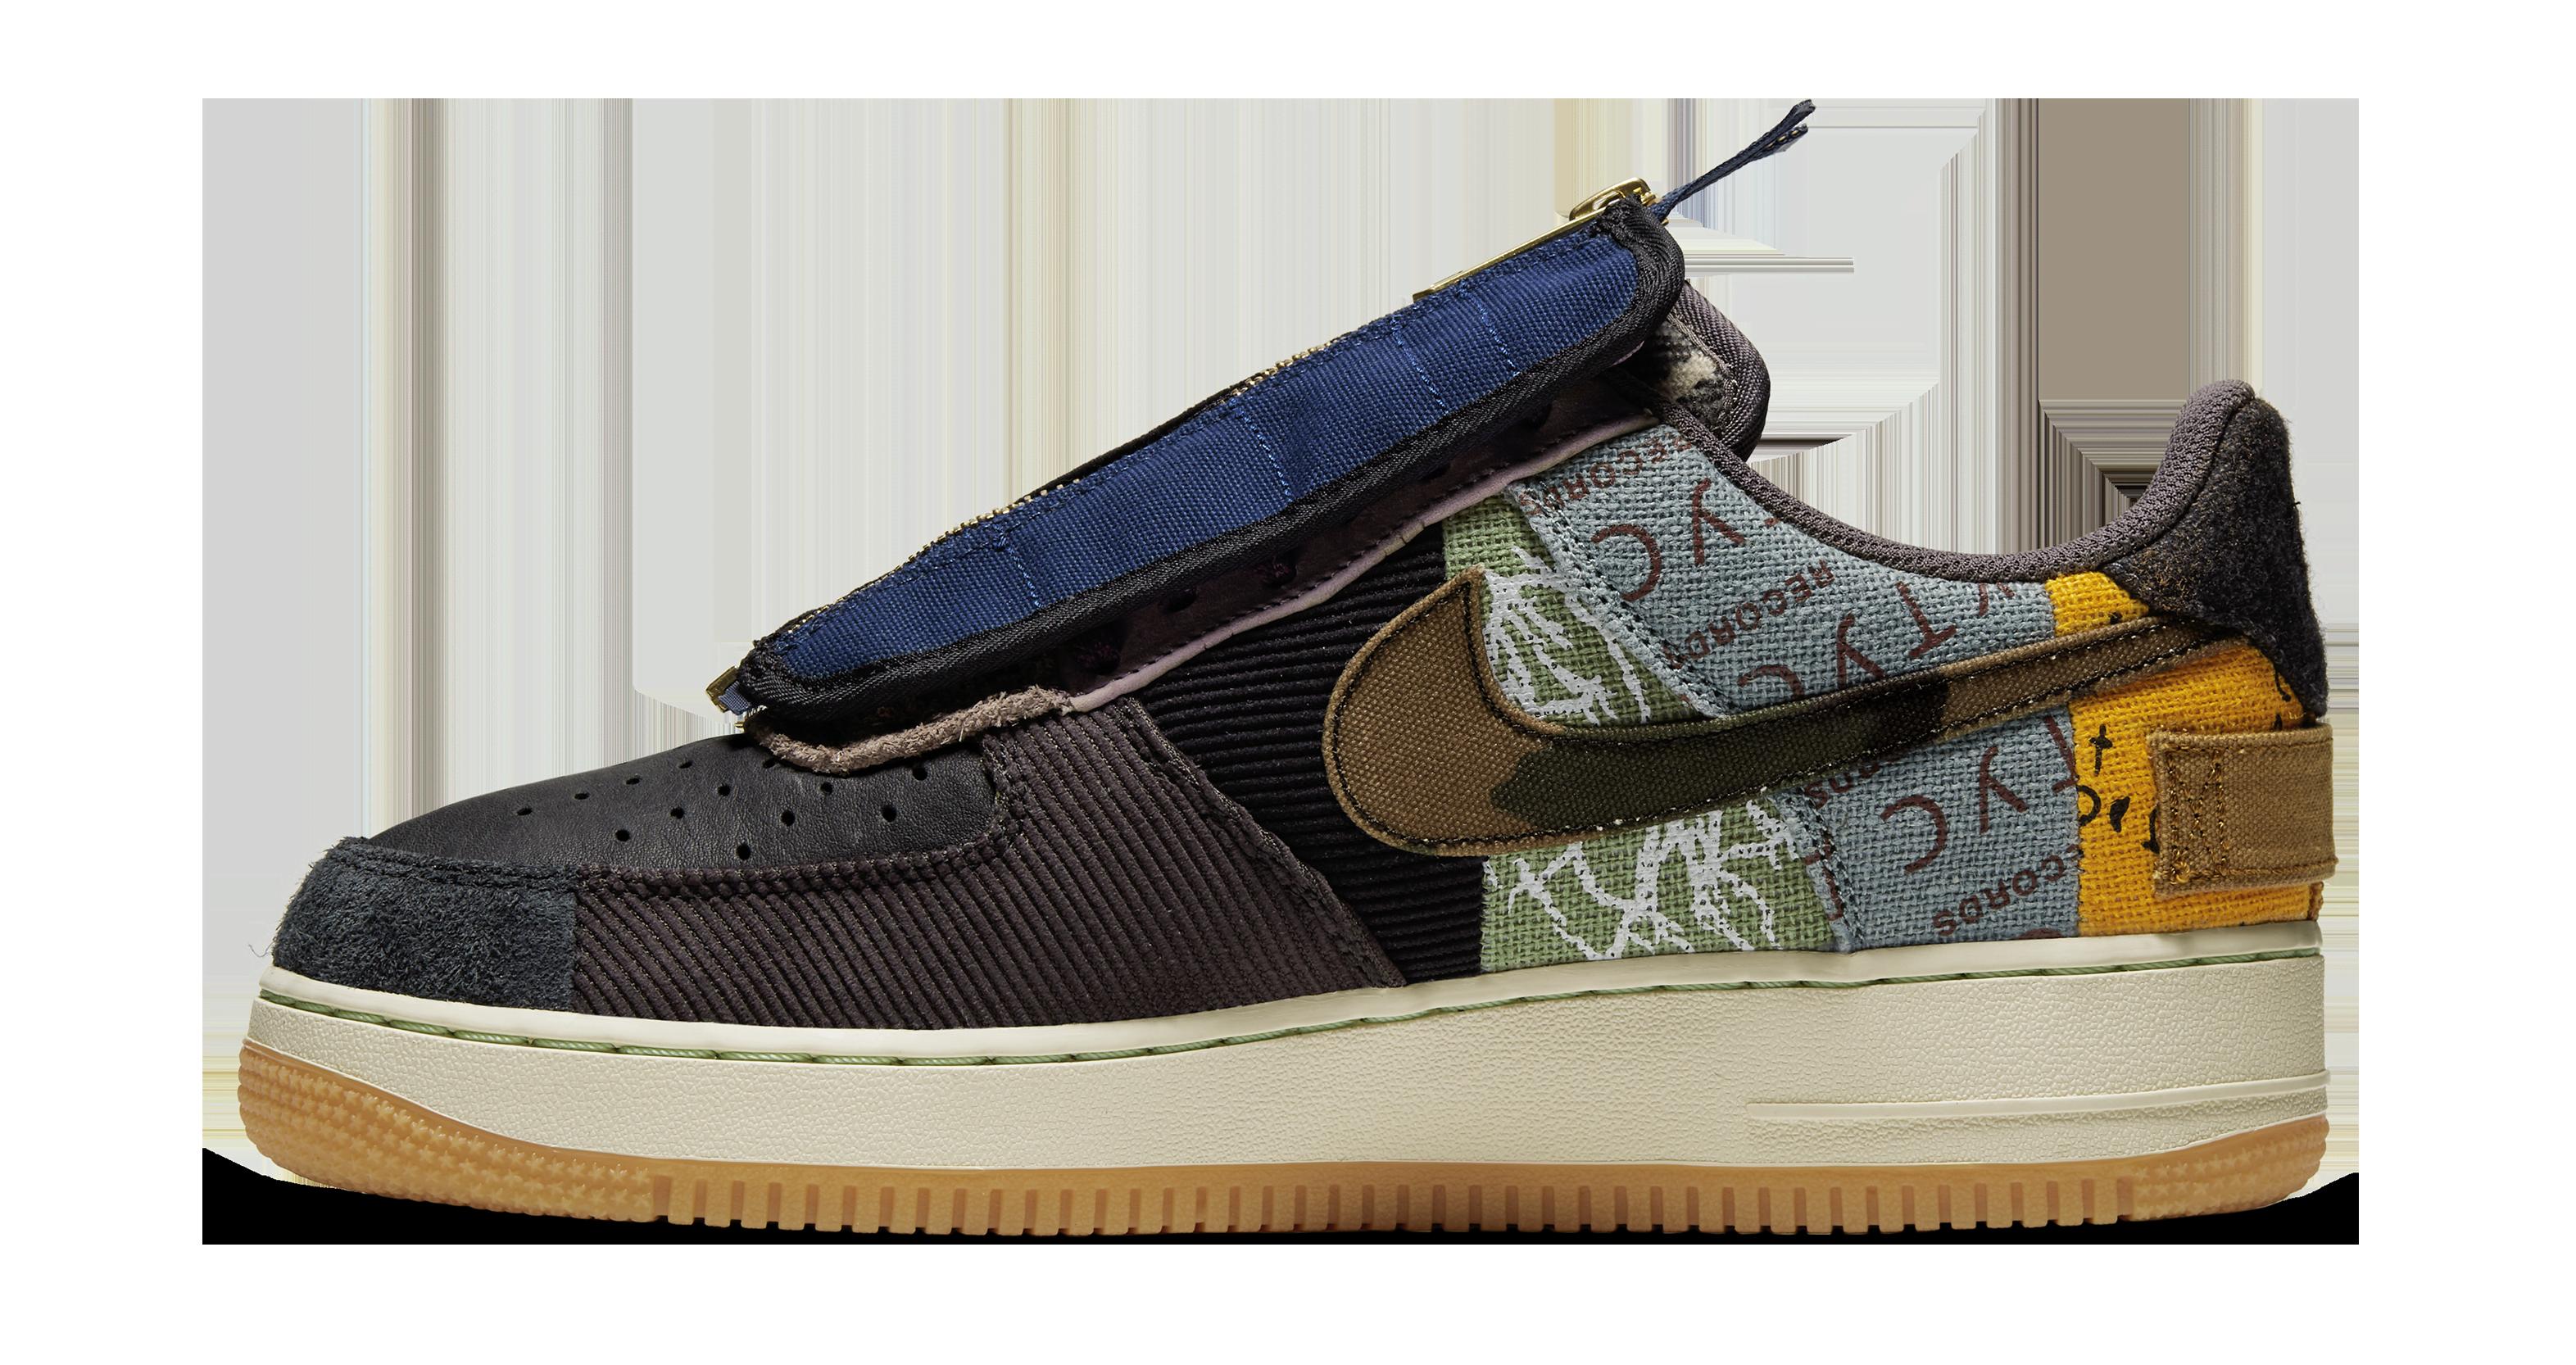 Travis Scott x Nike Air Force 1 Low 'Multi ColorMuted